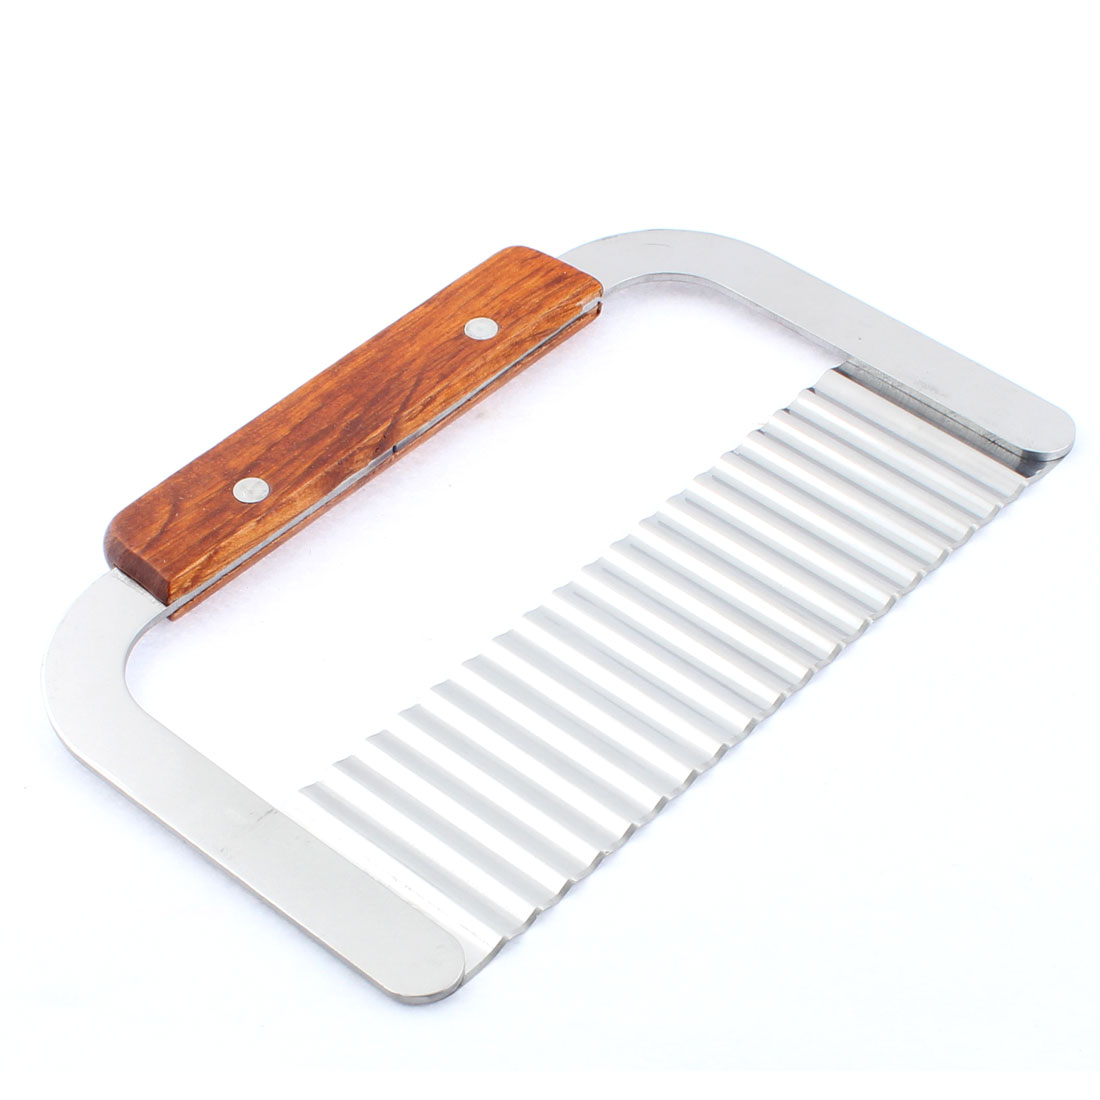 18.5cm Long Wooden Handle Potato Chip Dough Vegetable Wave Slicer Crinkle Cutter by